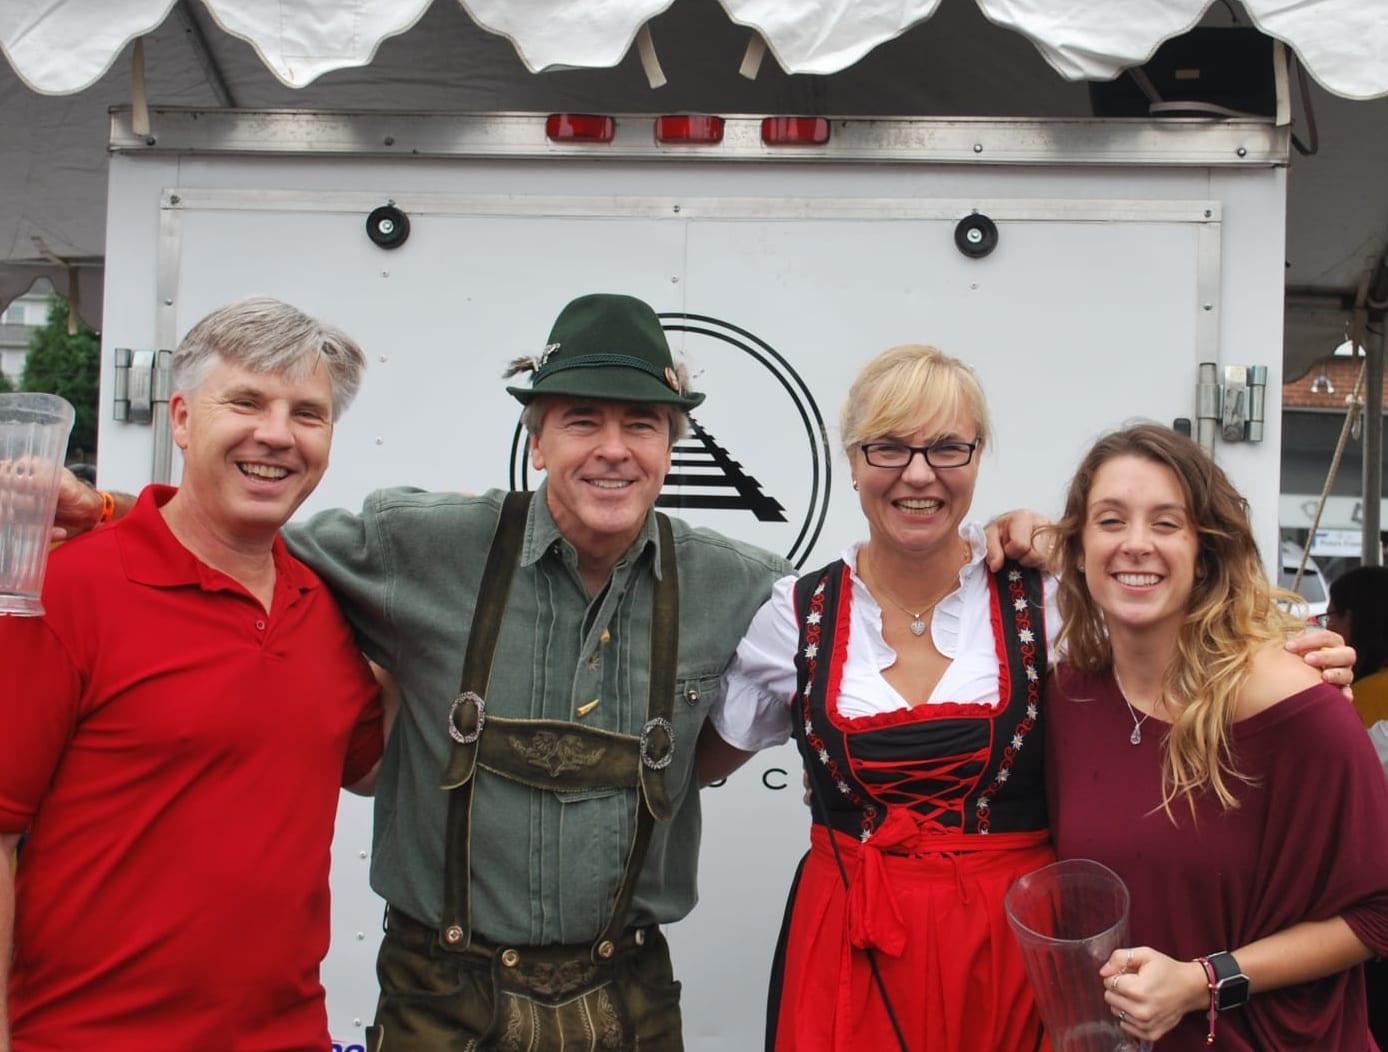 Vienna Oktoberfest: October 7, 11am - 7pm